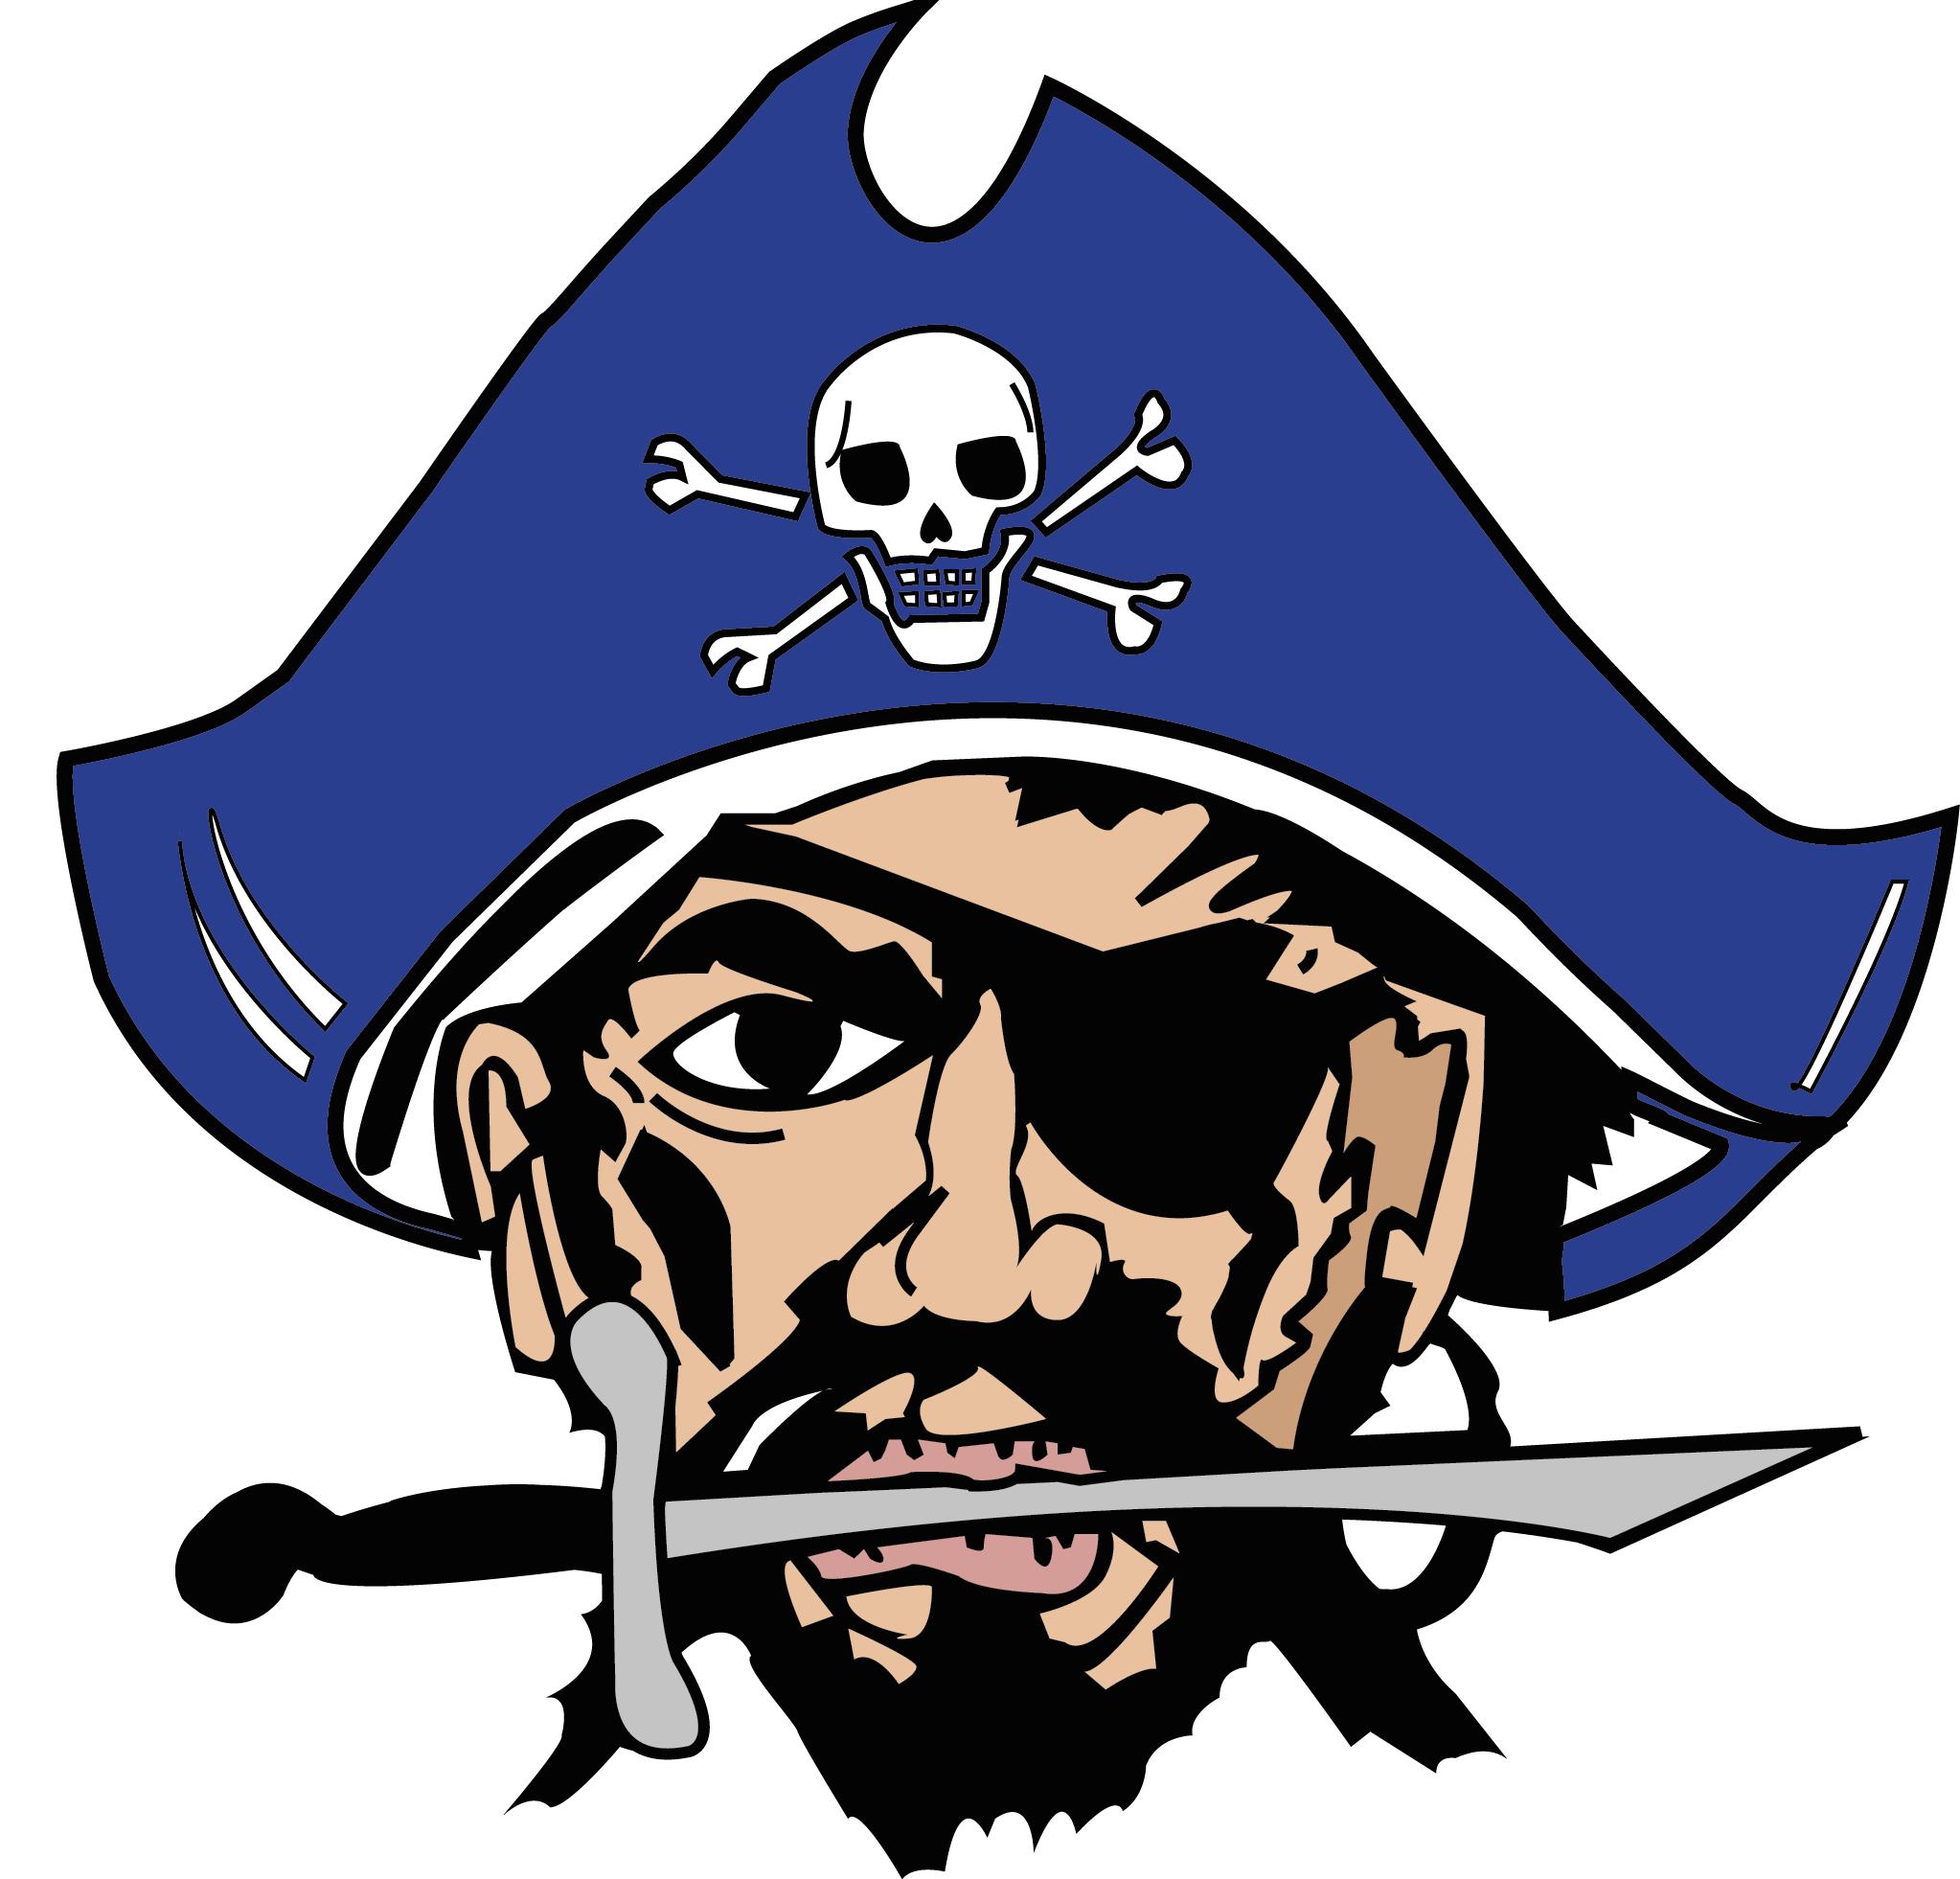 Pirate_Big.jpg